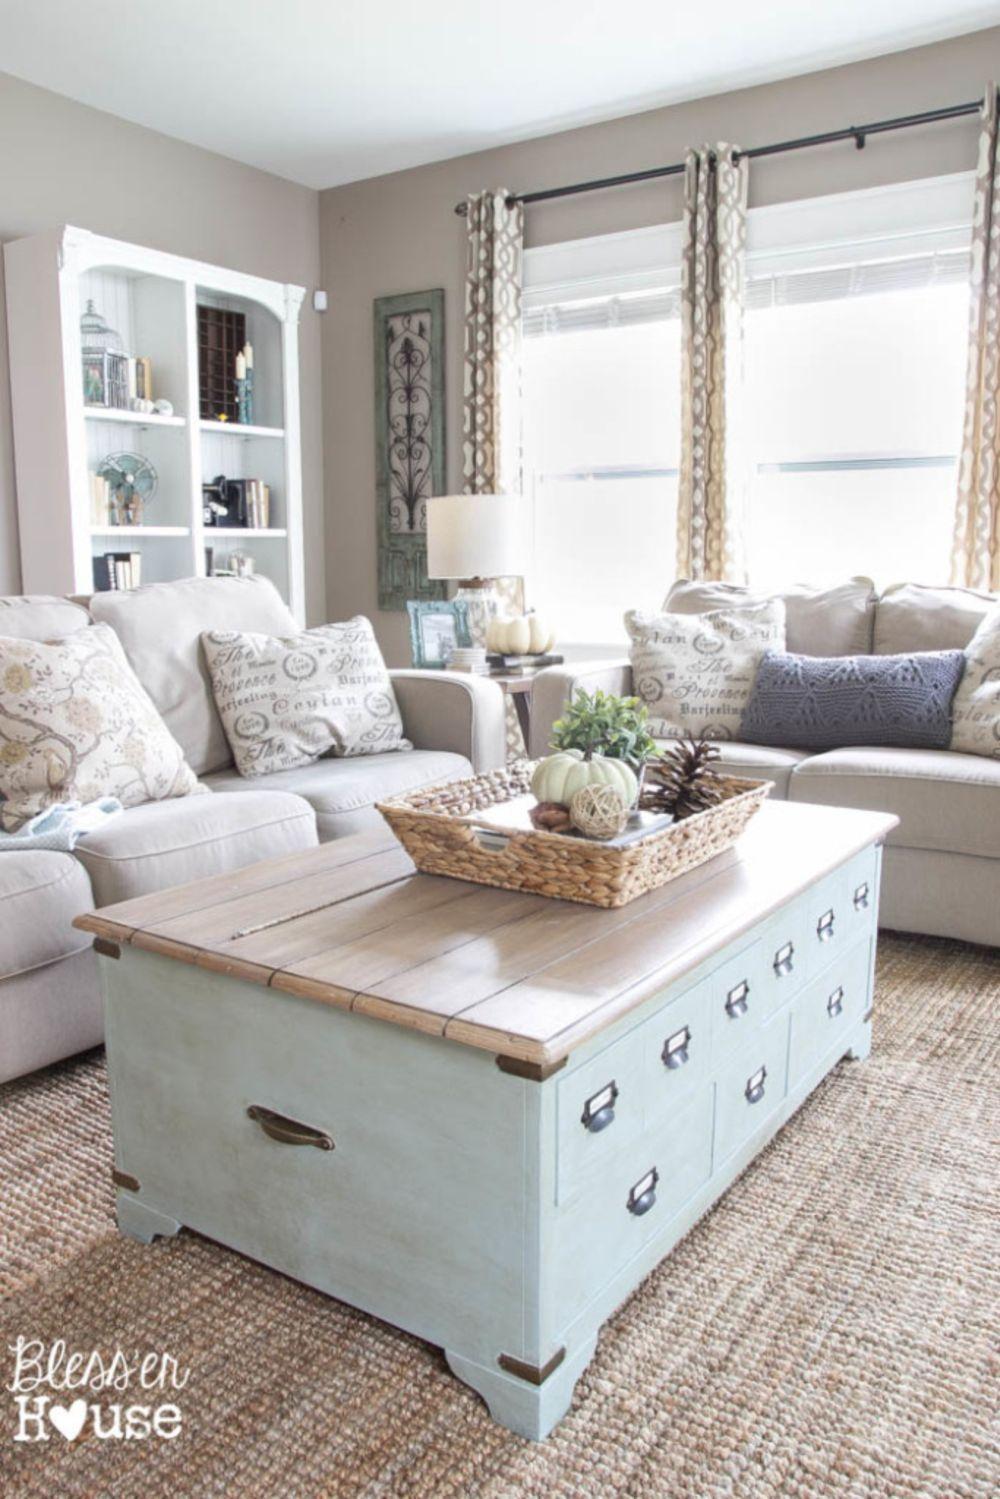 SImple-Rustic-Farmhouse-Living-Room-Decor-Ideas-20.jpg (1000×1499 ...